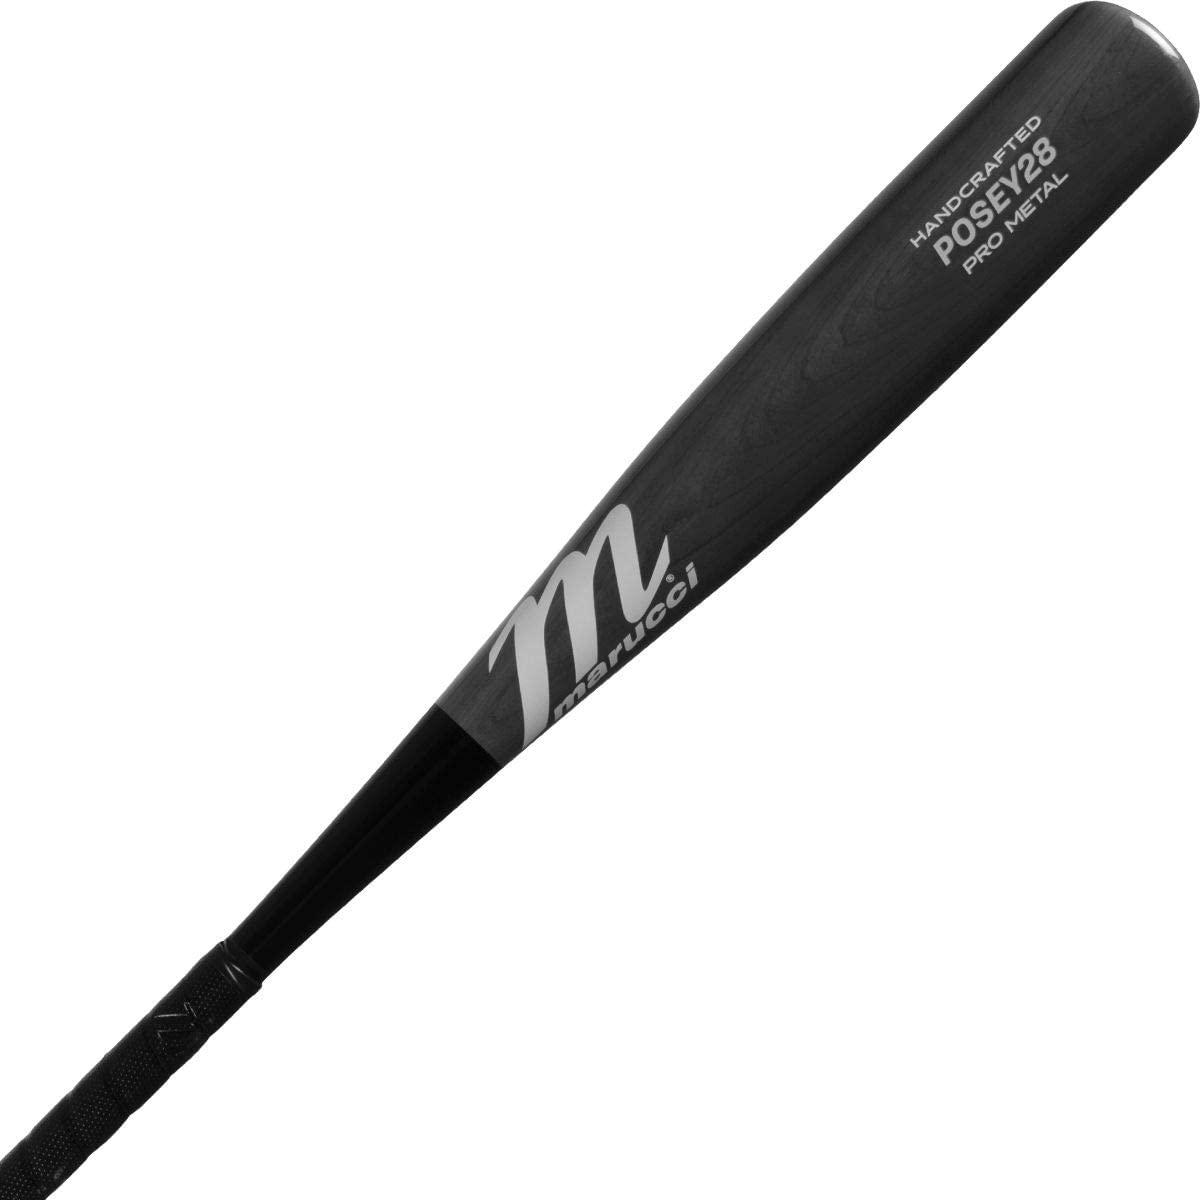 marucci-posey28-10-usssa-baseball-bat-30-inch-20-oz MSBP2810S-3020   <ul class=a-unordered-list a-vertical a-spacing-mini> <li><span class=a-list-item>AZ105 alloy the strongest aluminum on